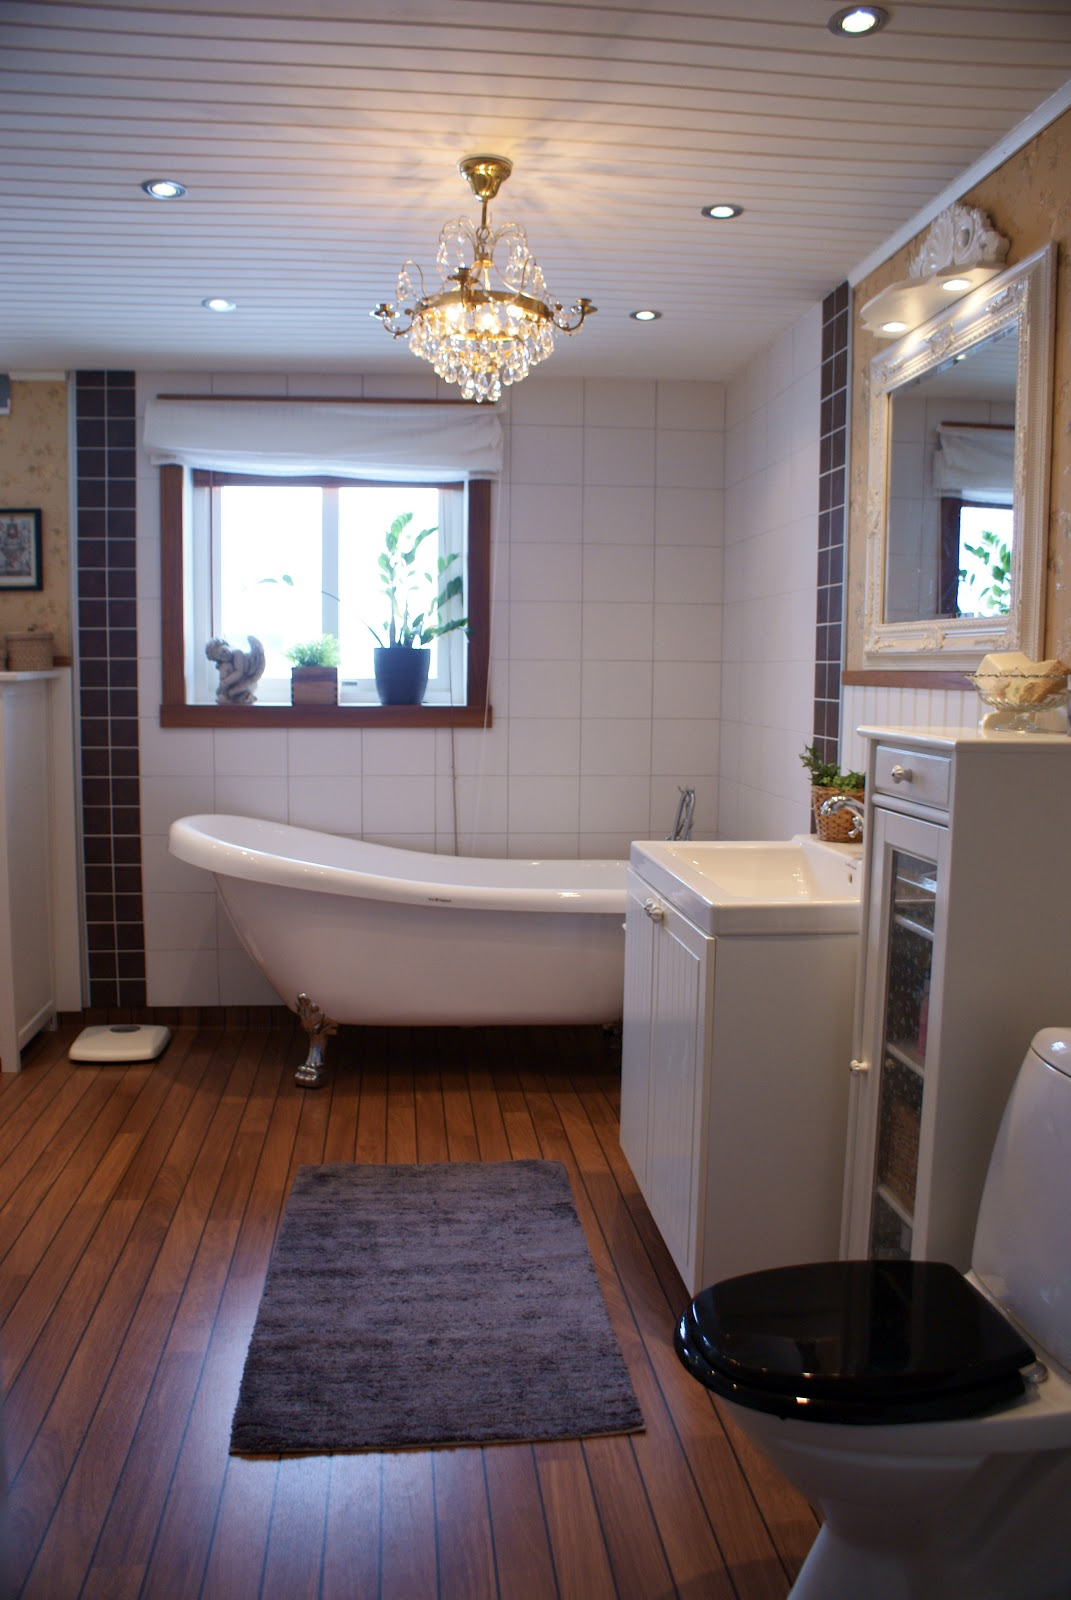 Lunadsign: mitt badrum